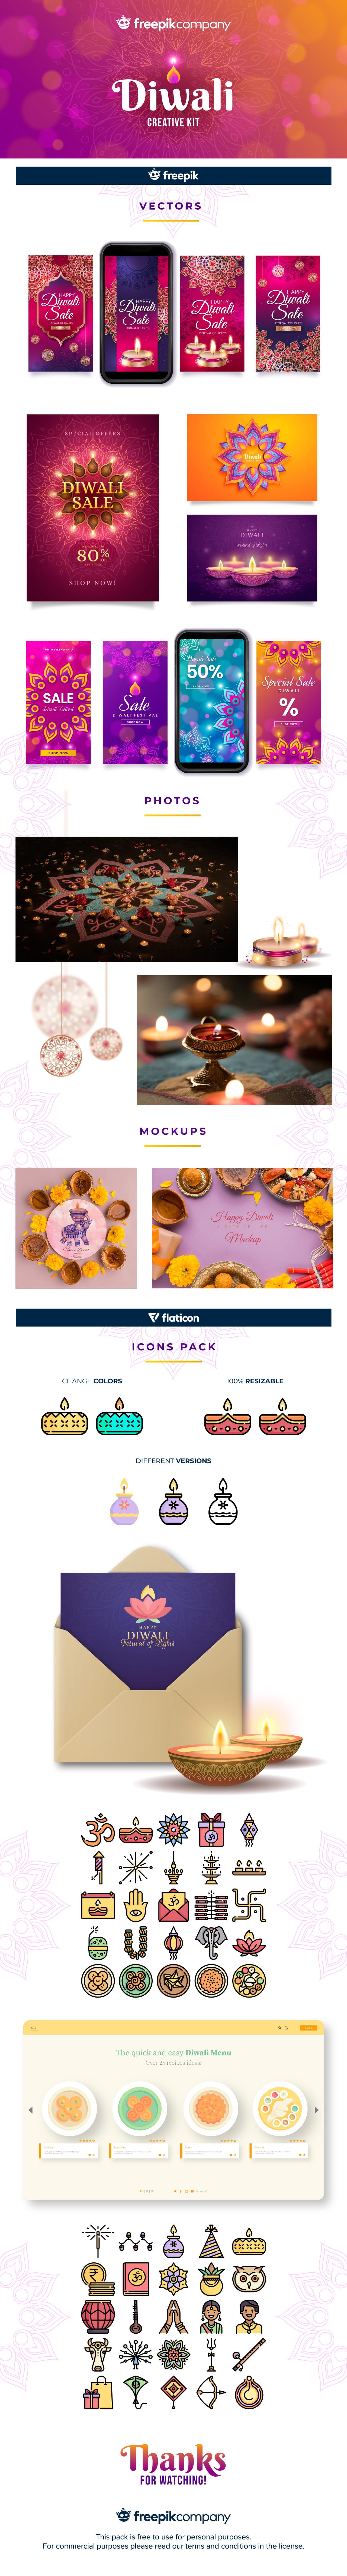 Diwali Creative Kit